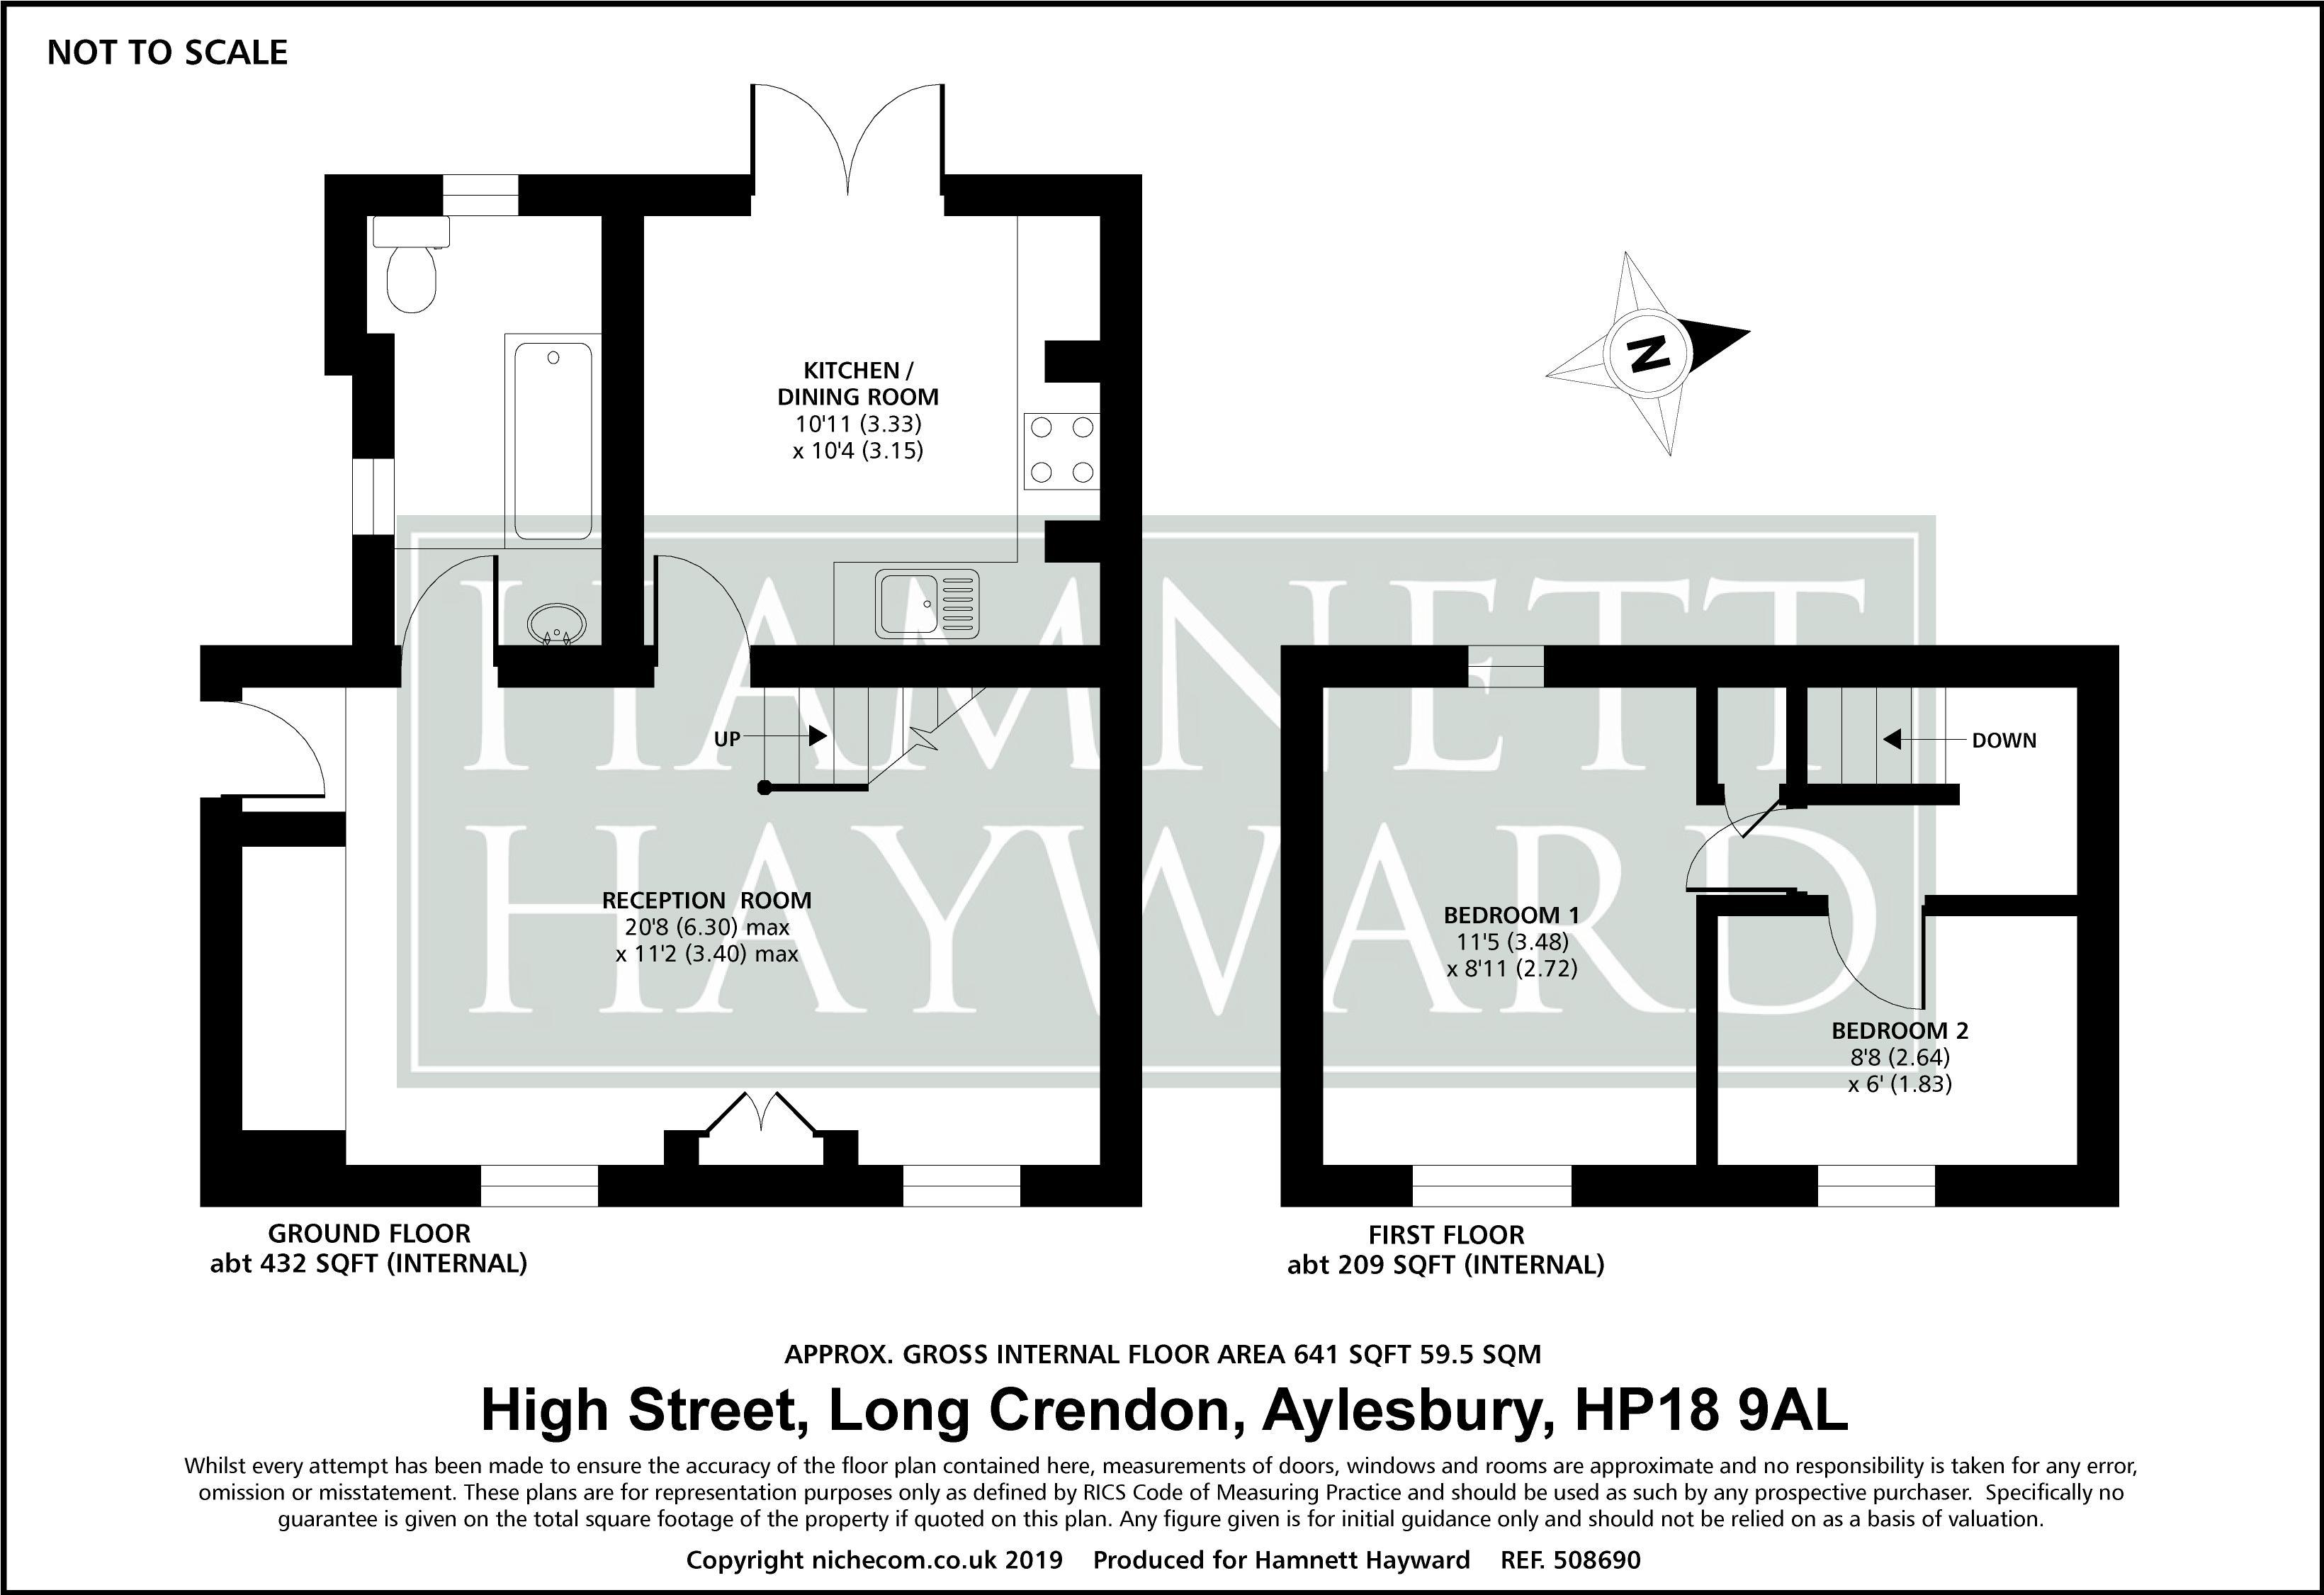 High Street Long Crendon